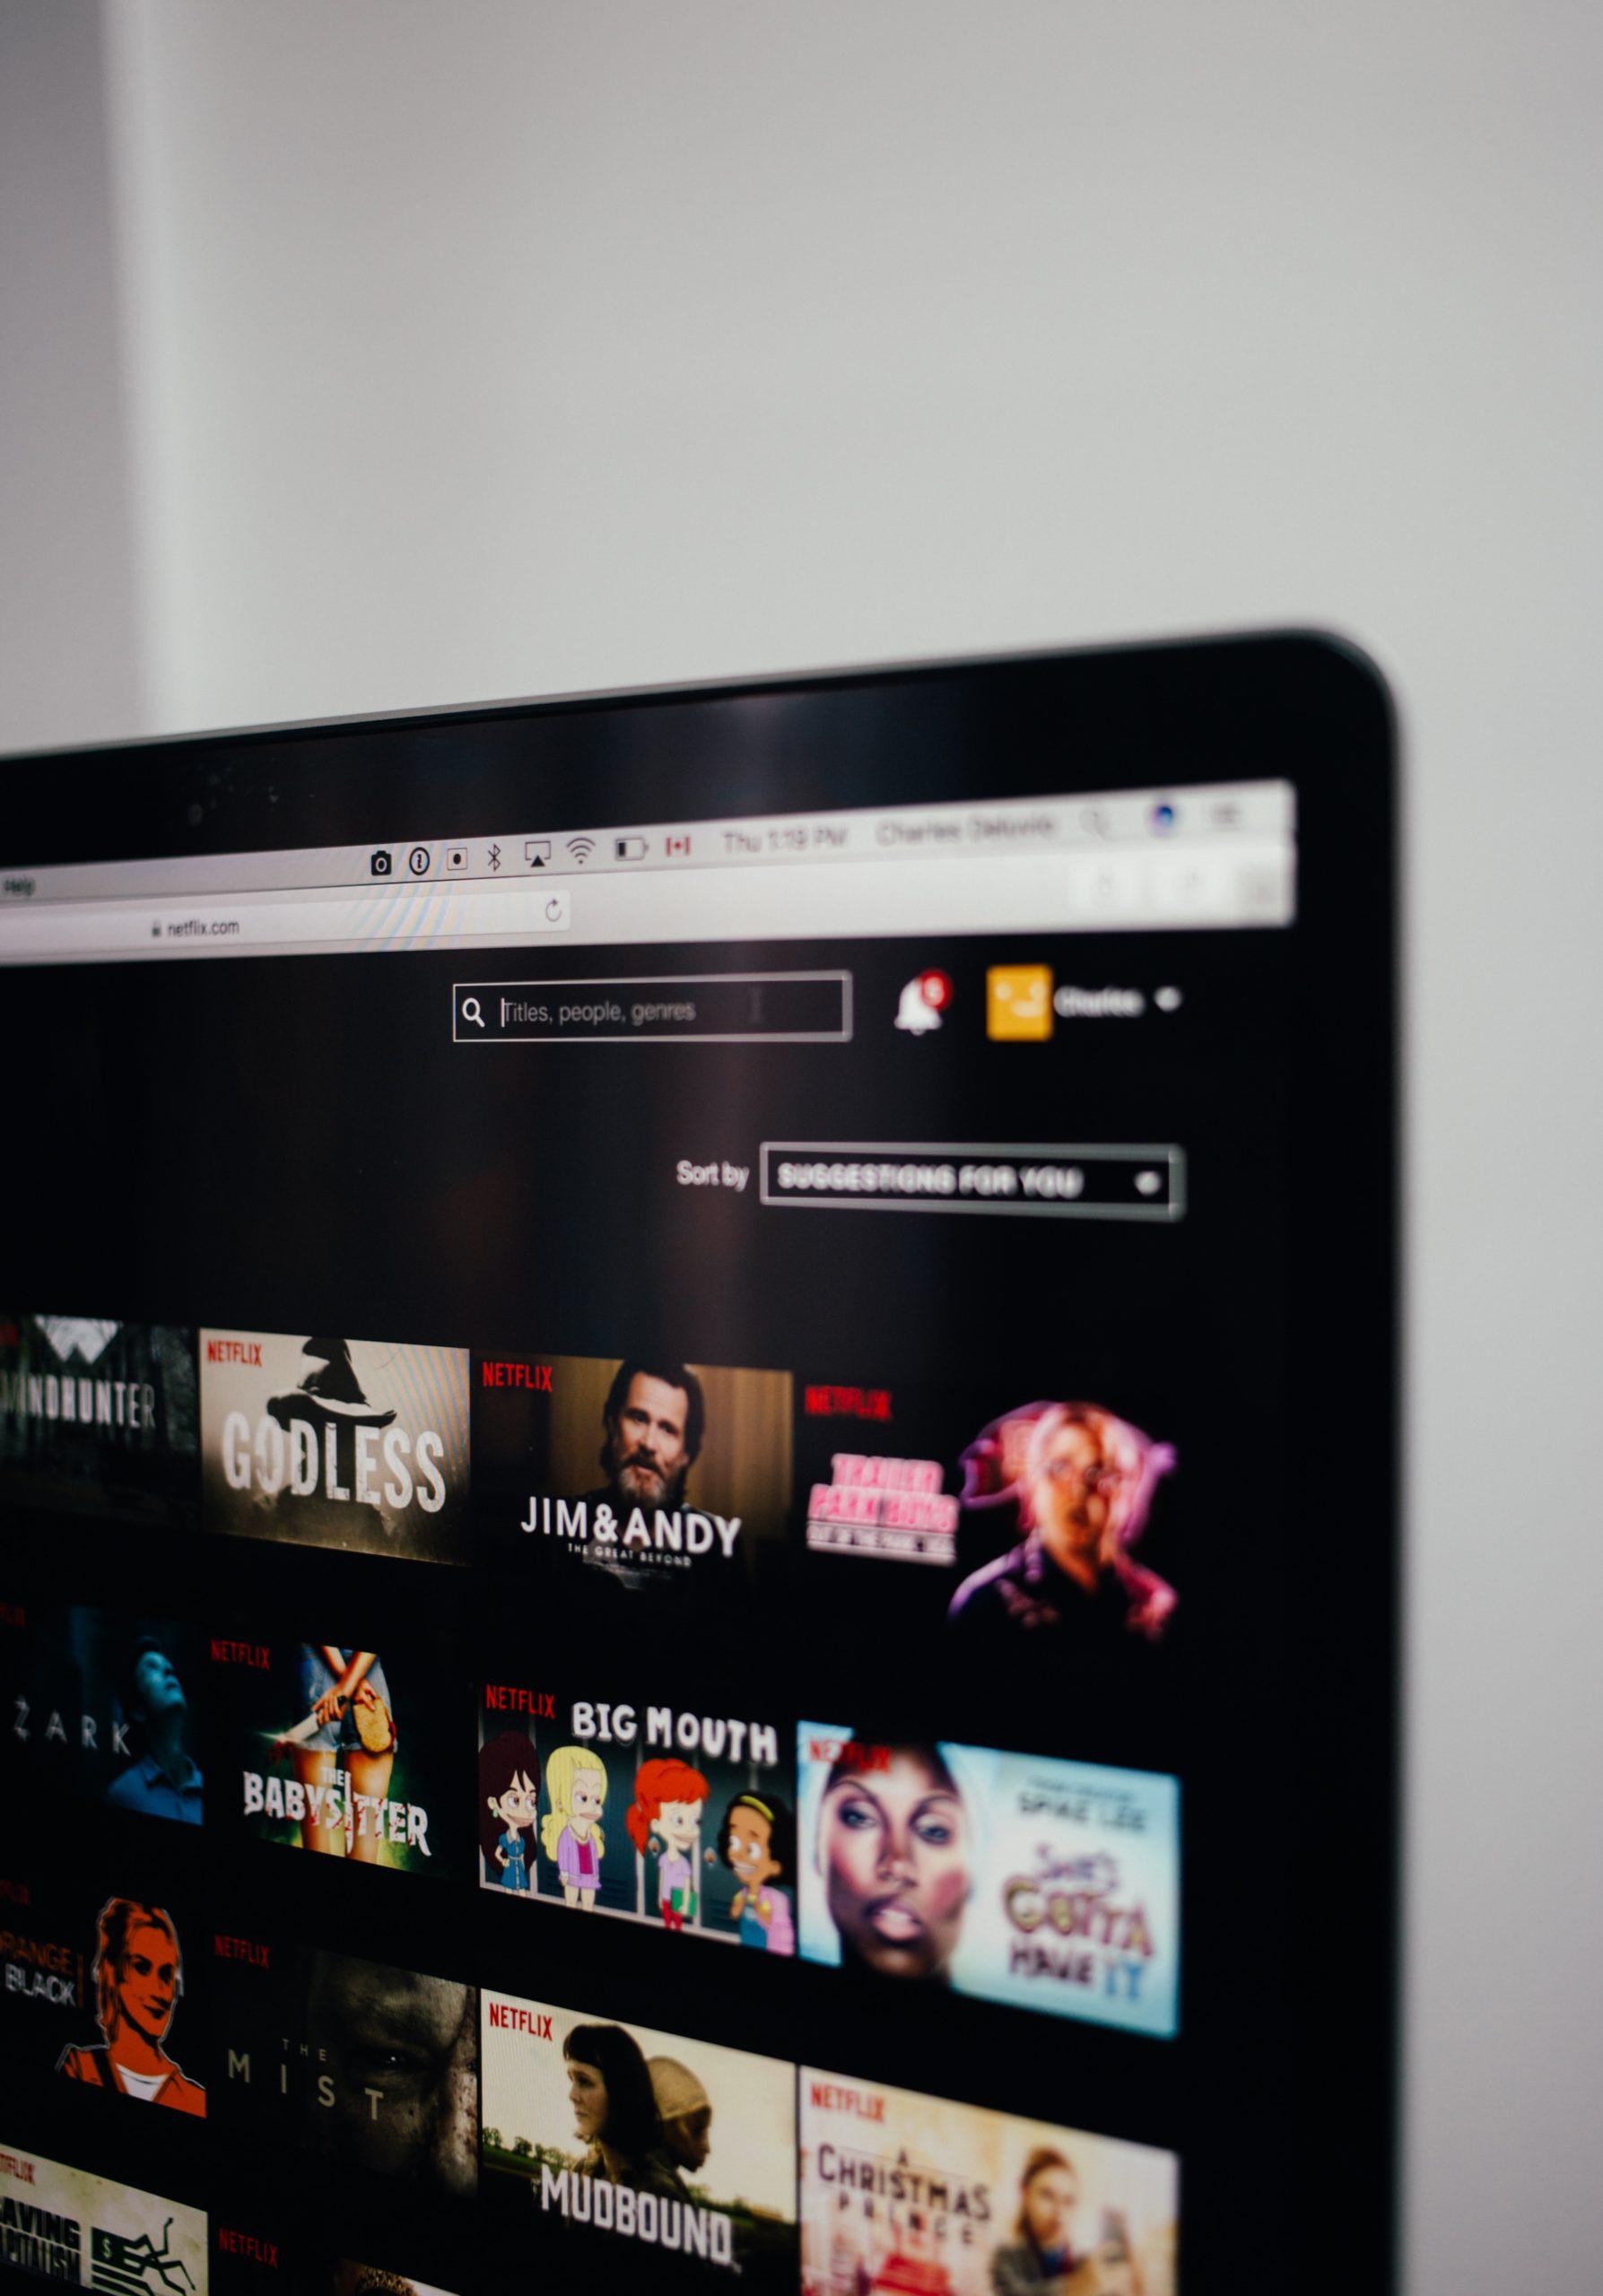 Netflix app opened on computer